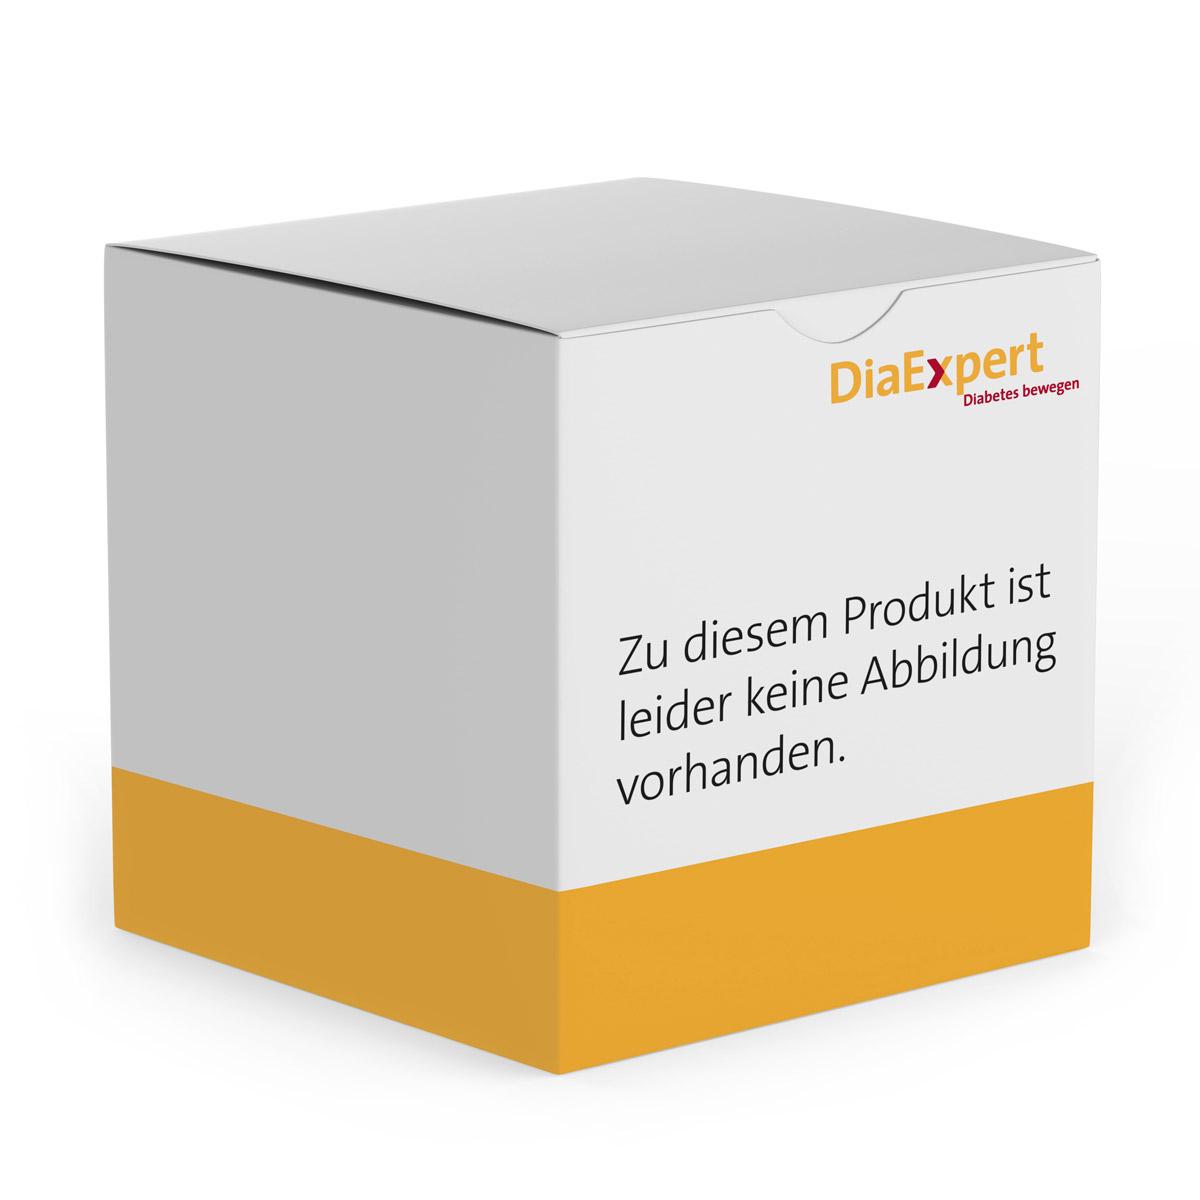 GlucoMen LX Plus Glu / Ket control Normal Kontrolllösung